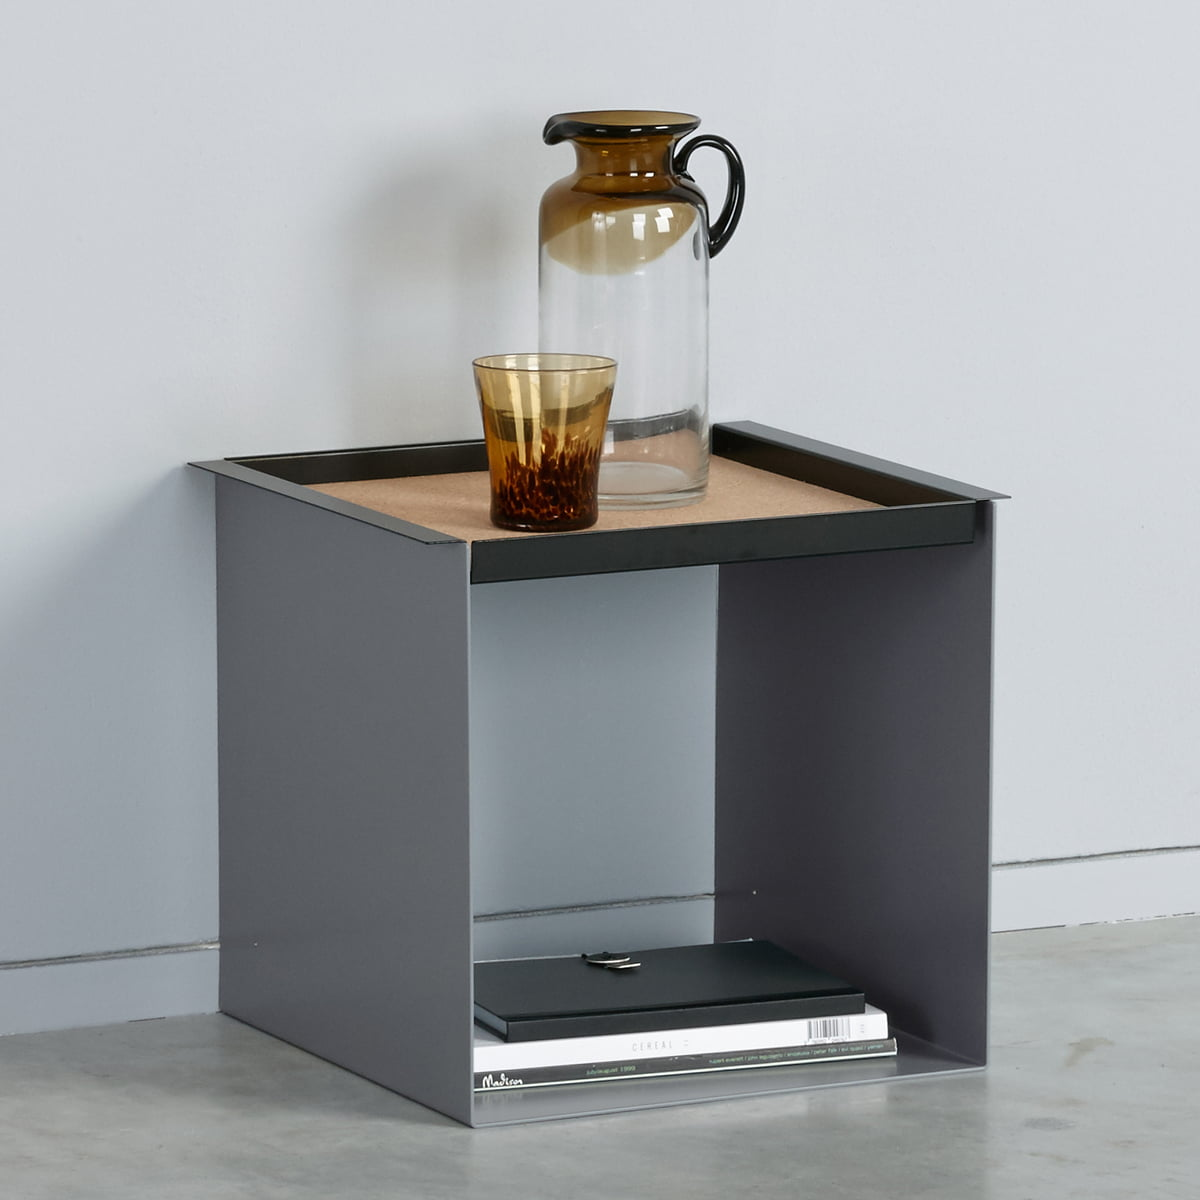 Christbaumkugeln Grau.Konstantin Slawinski Yu Tray Table Weiss Kork